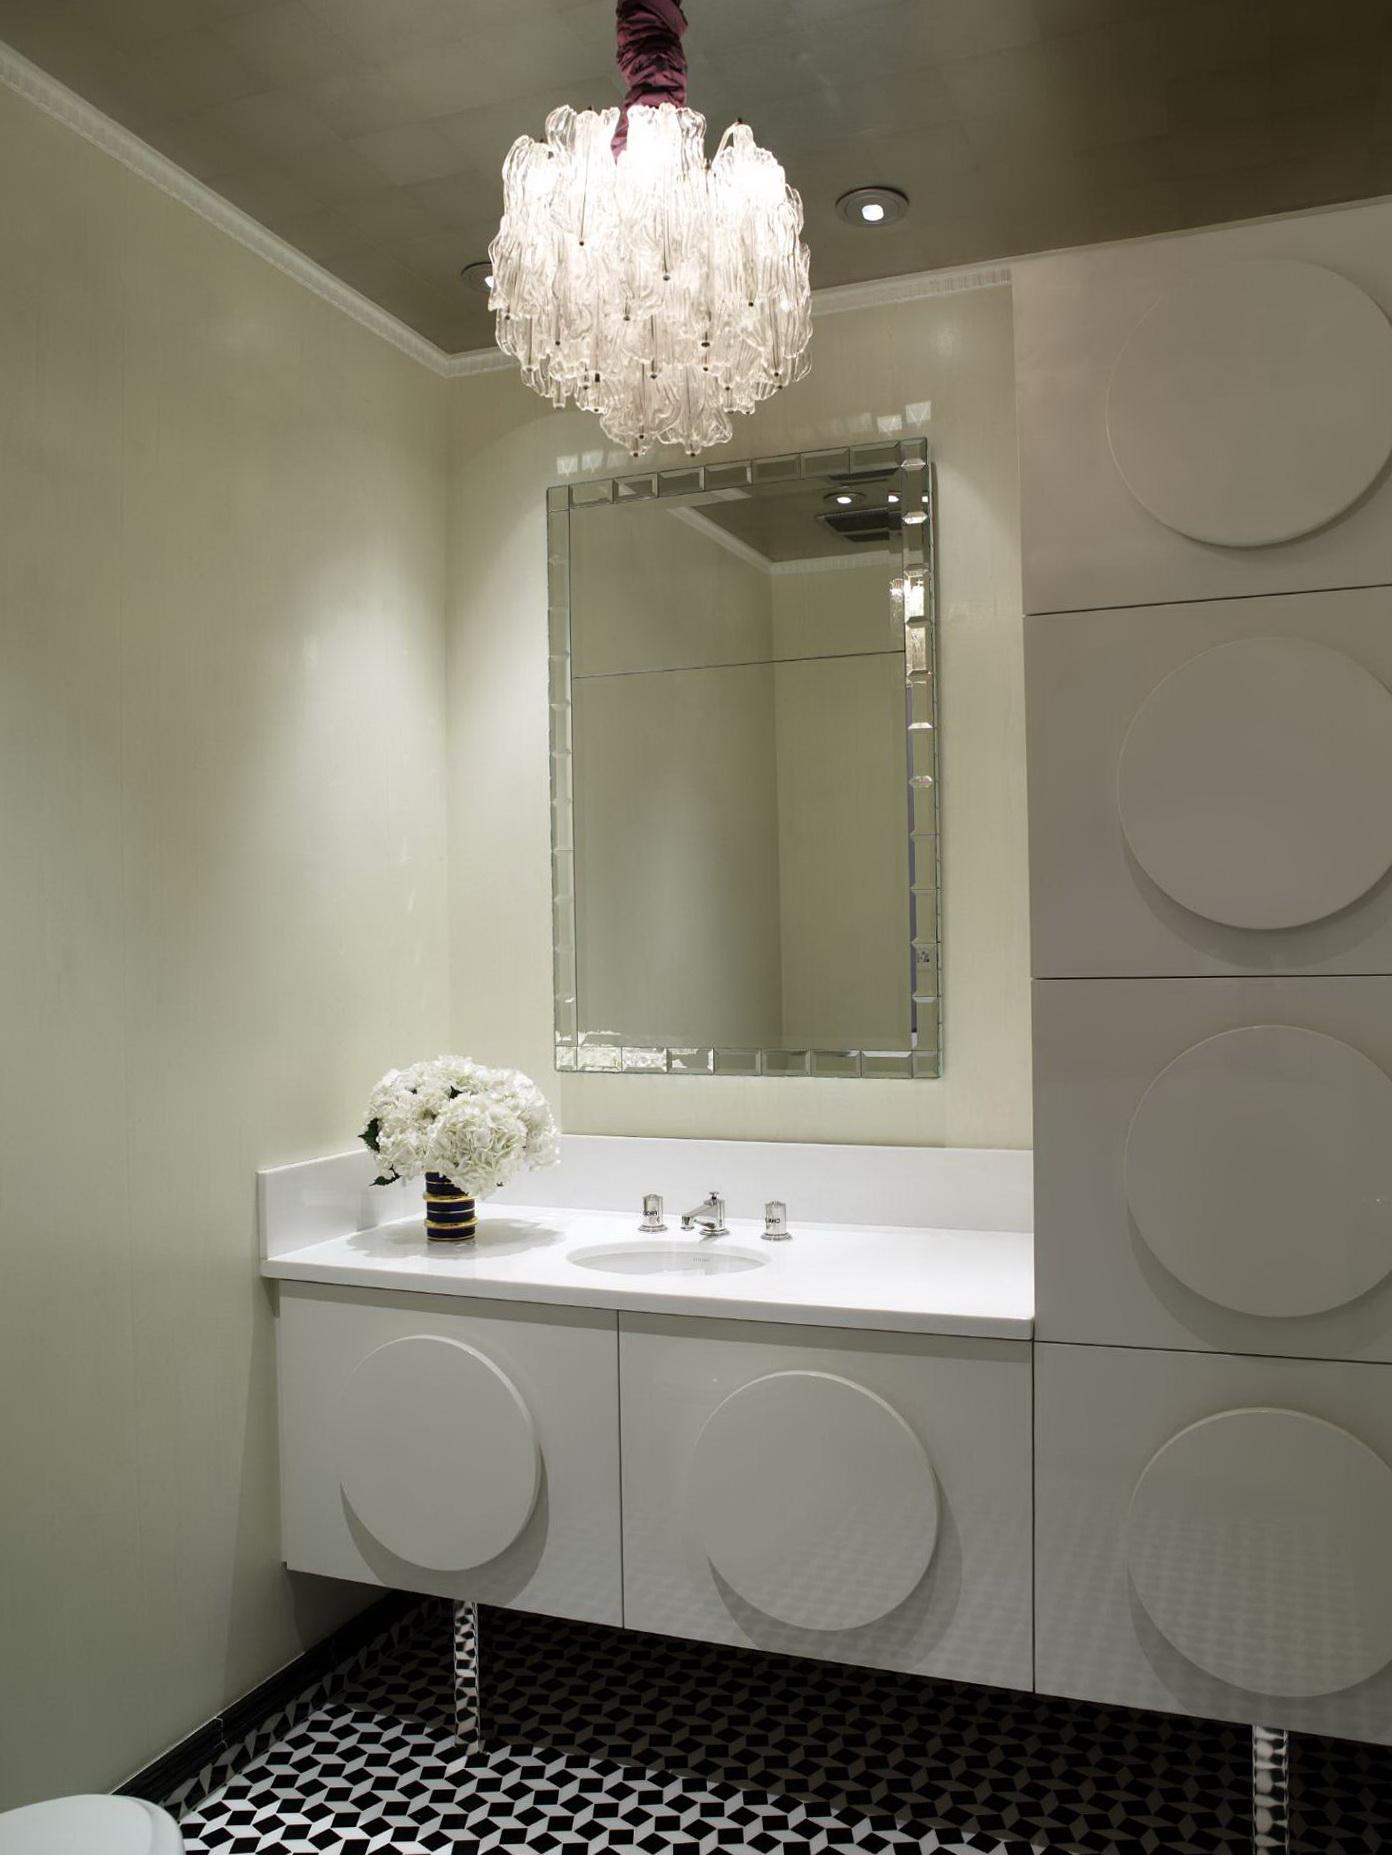 Chandelier In Small Bathroom